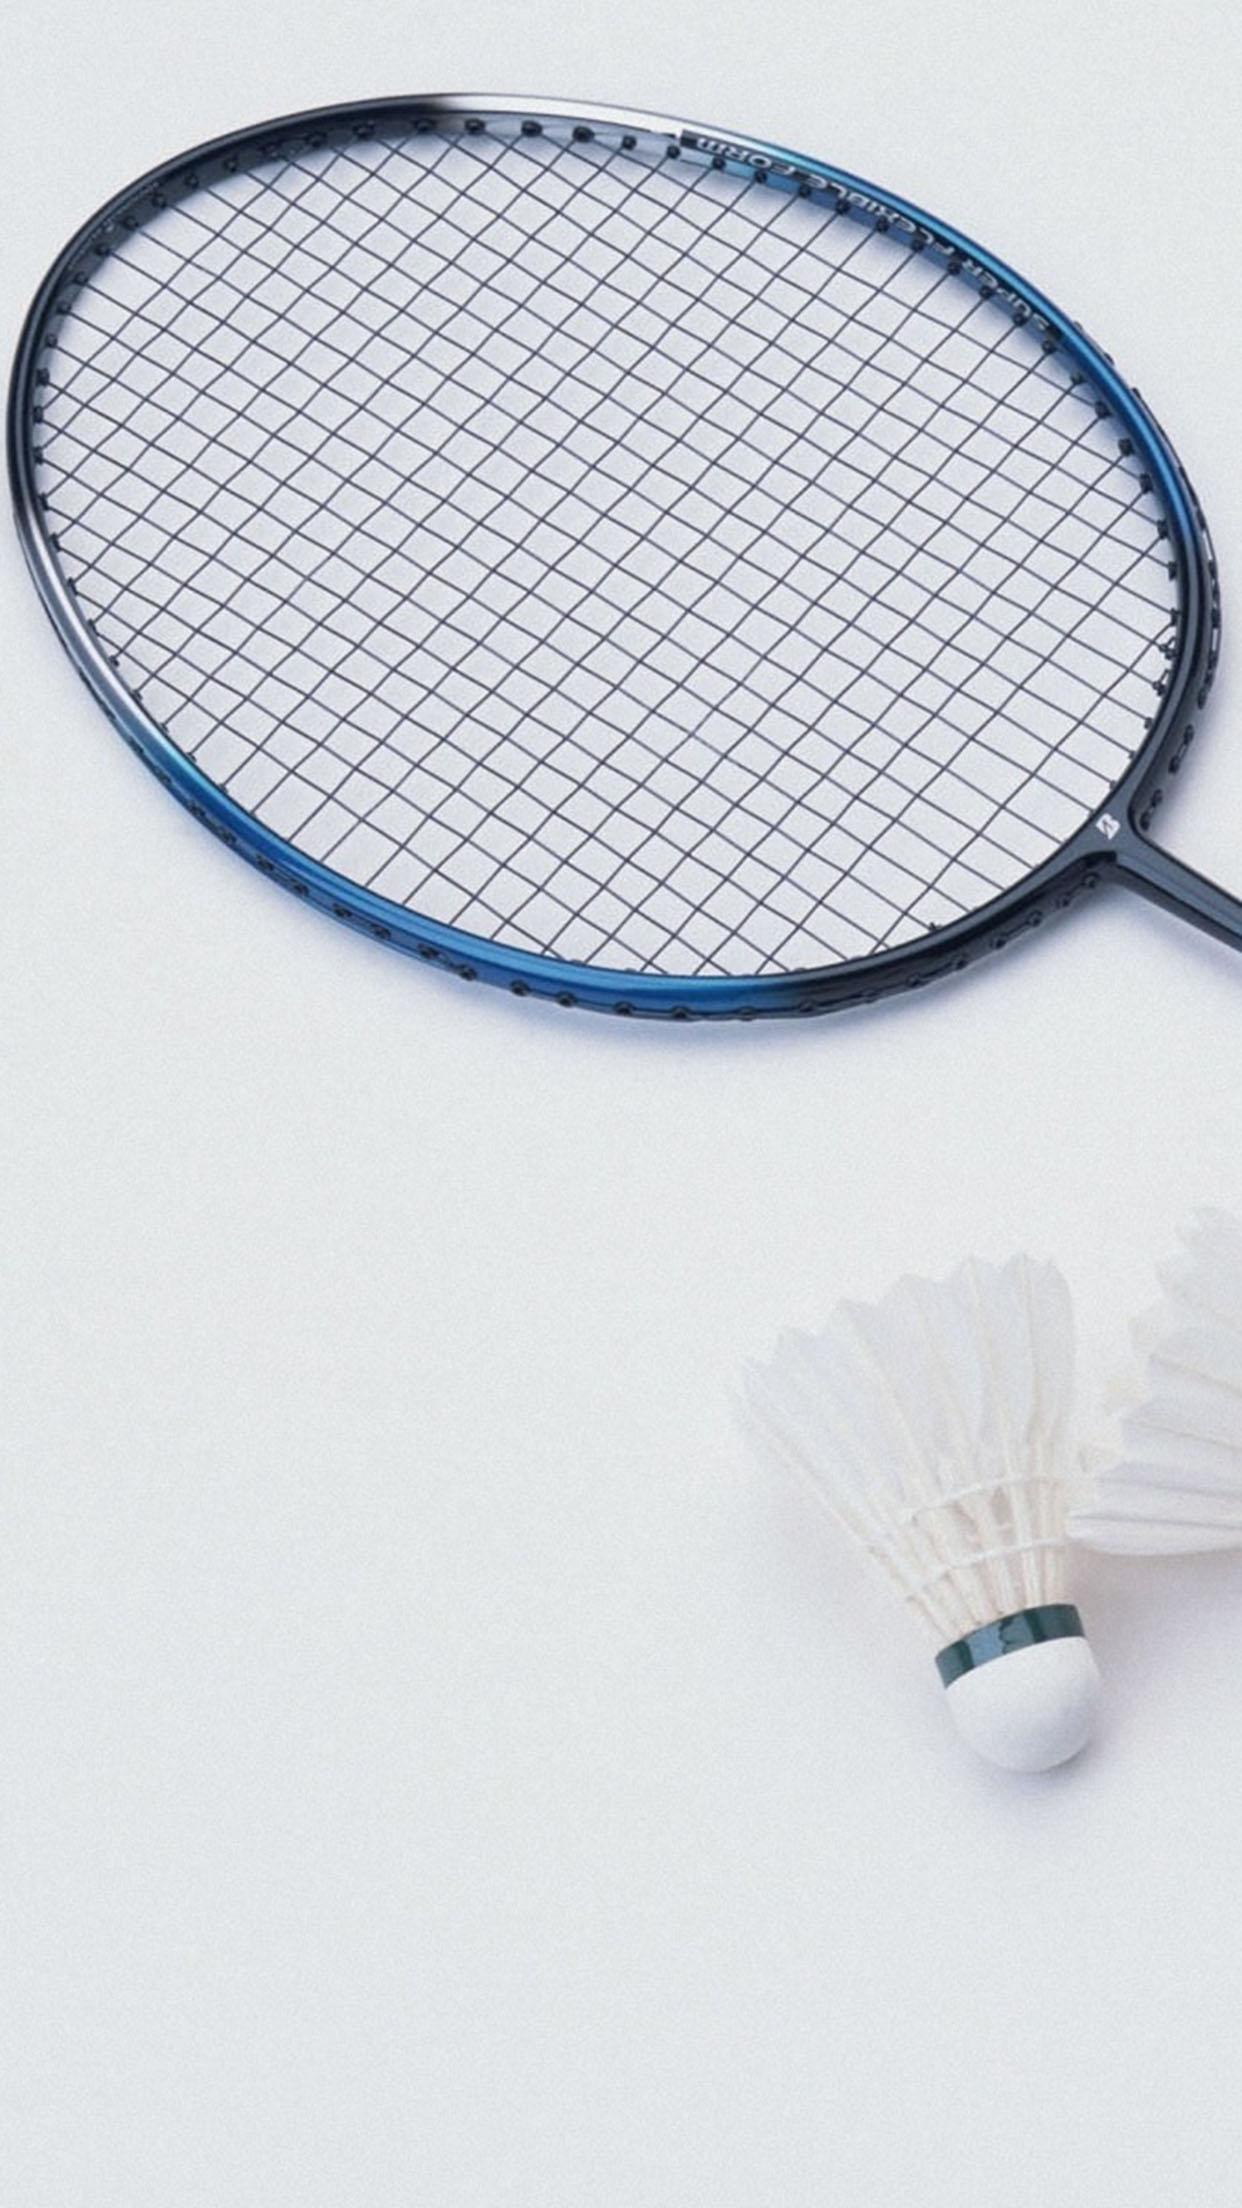 Badminton Badminton racquets 3Wallpapers iPhone Parallax Badminton racquets